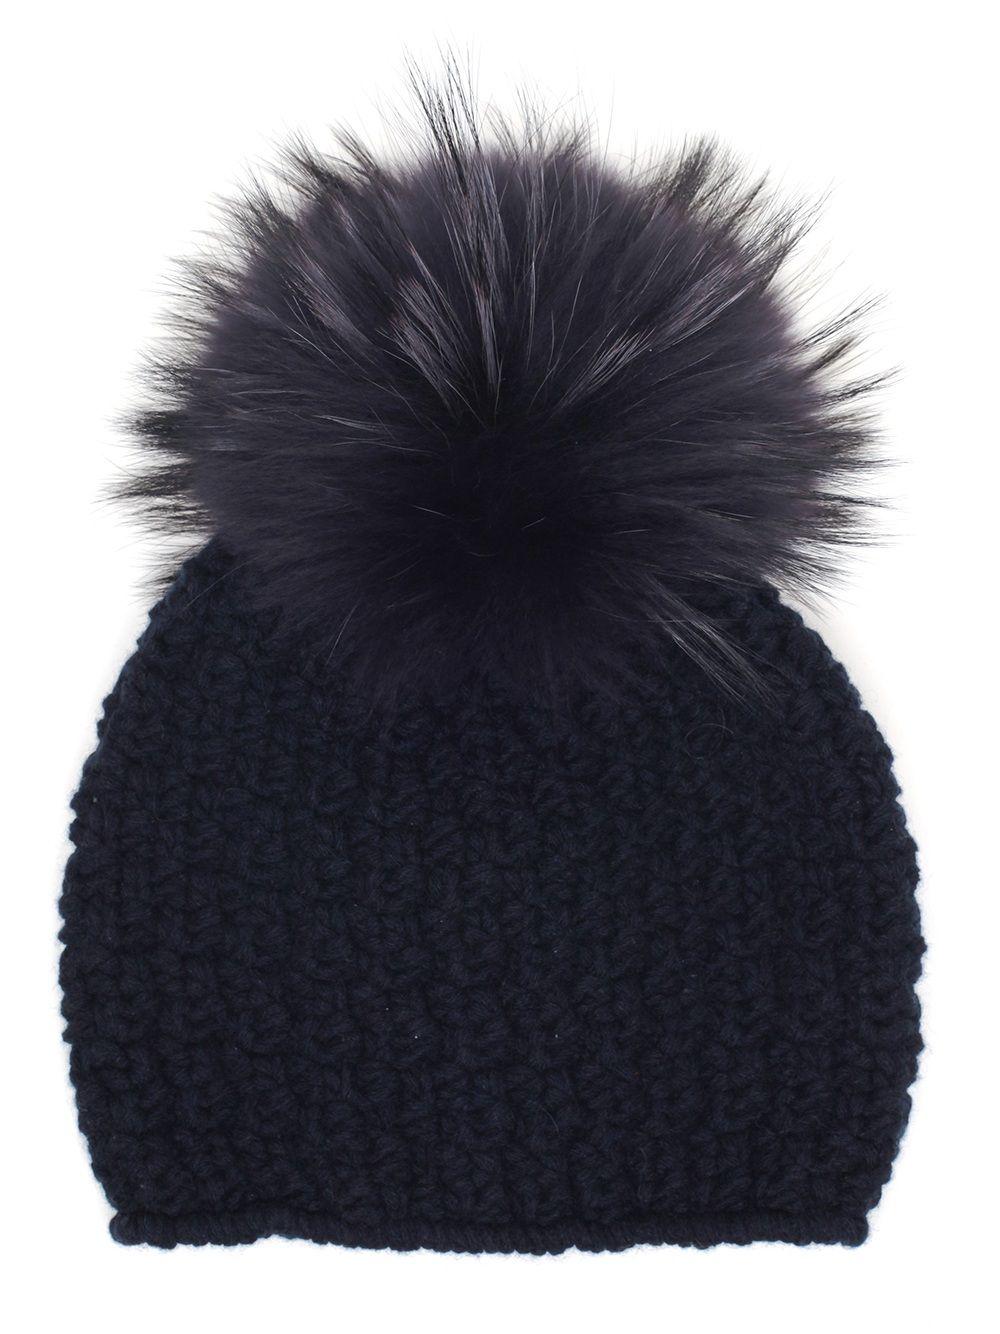 knitted fox fur scarf - Black inverni lYXSO1QLrj